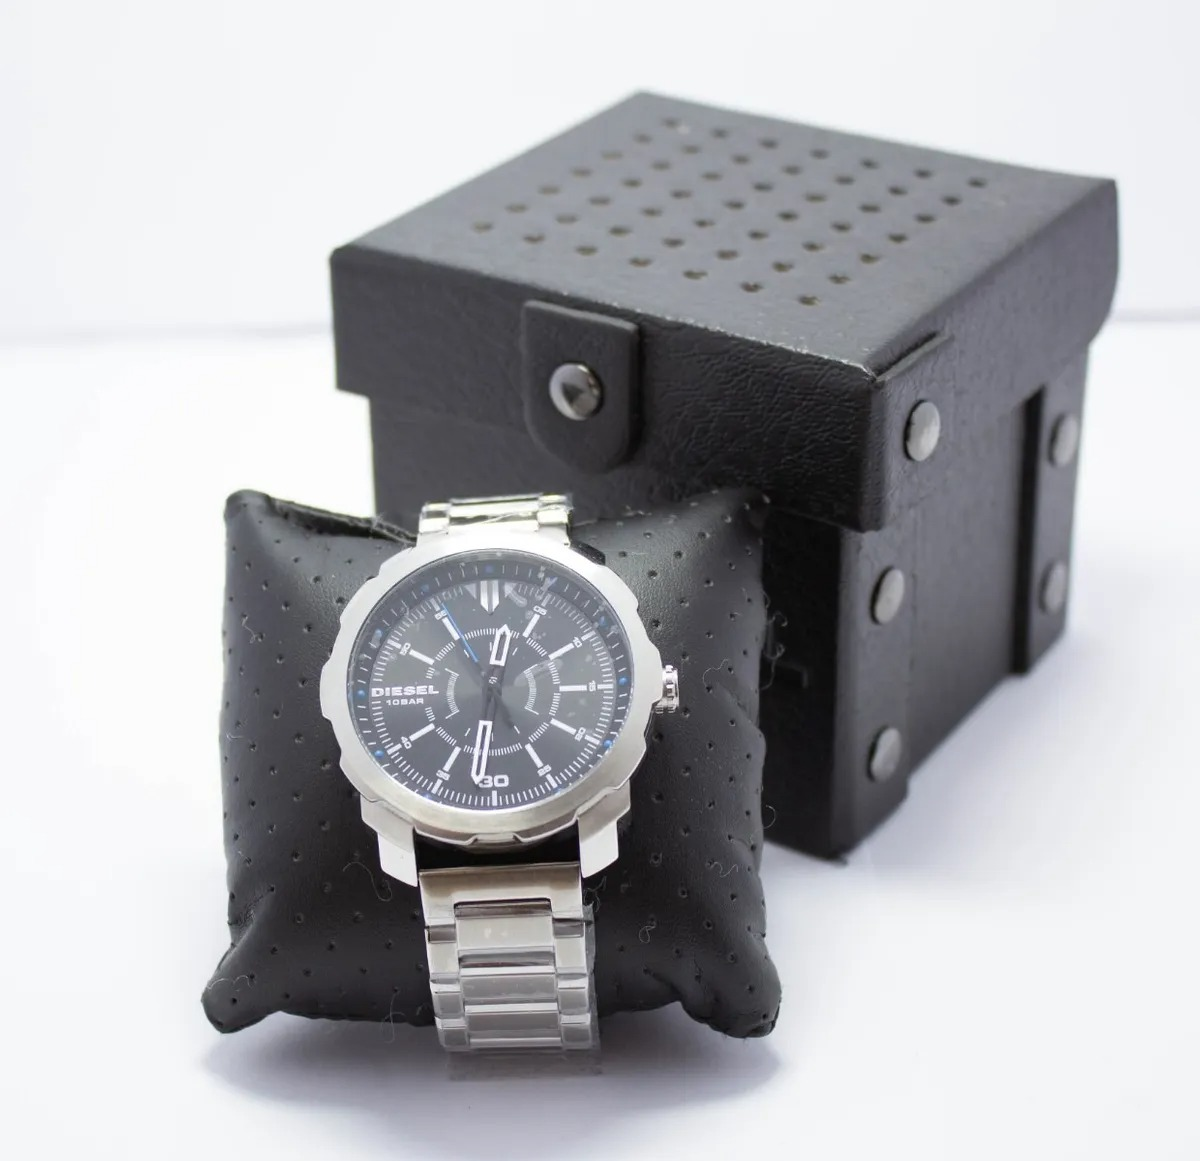 Relógio Diesel Masculino Aço com Fundo Preto - DZ1786/1PN